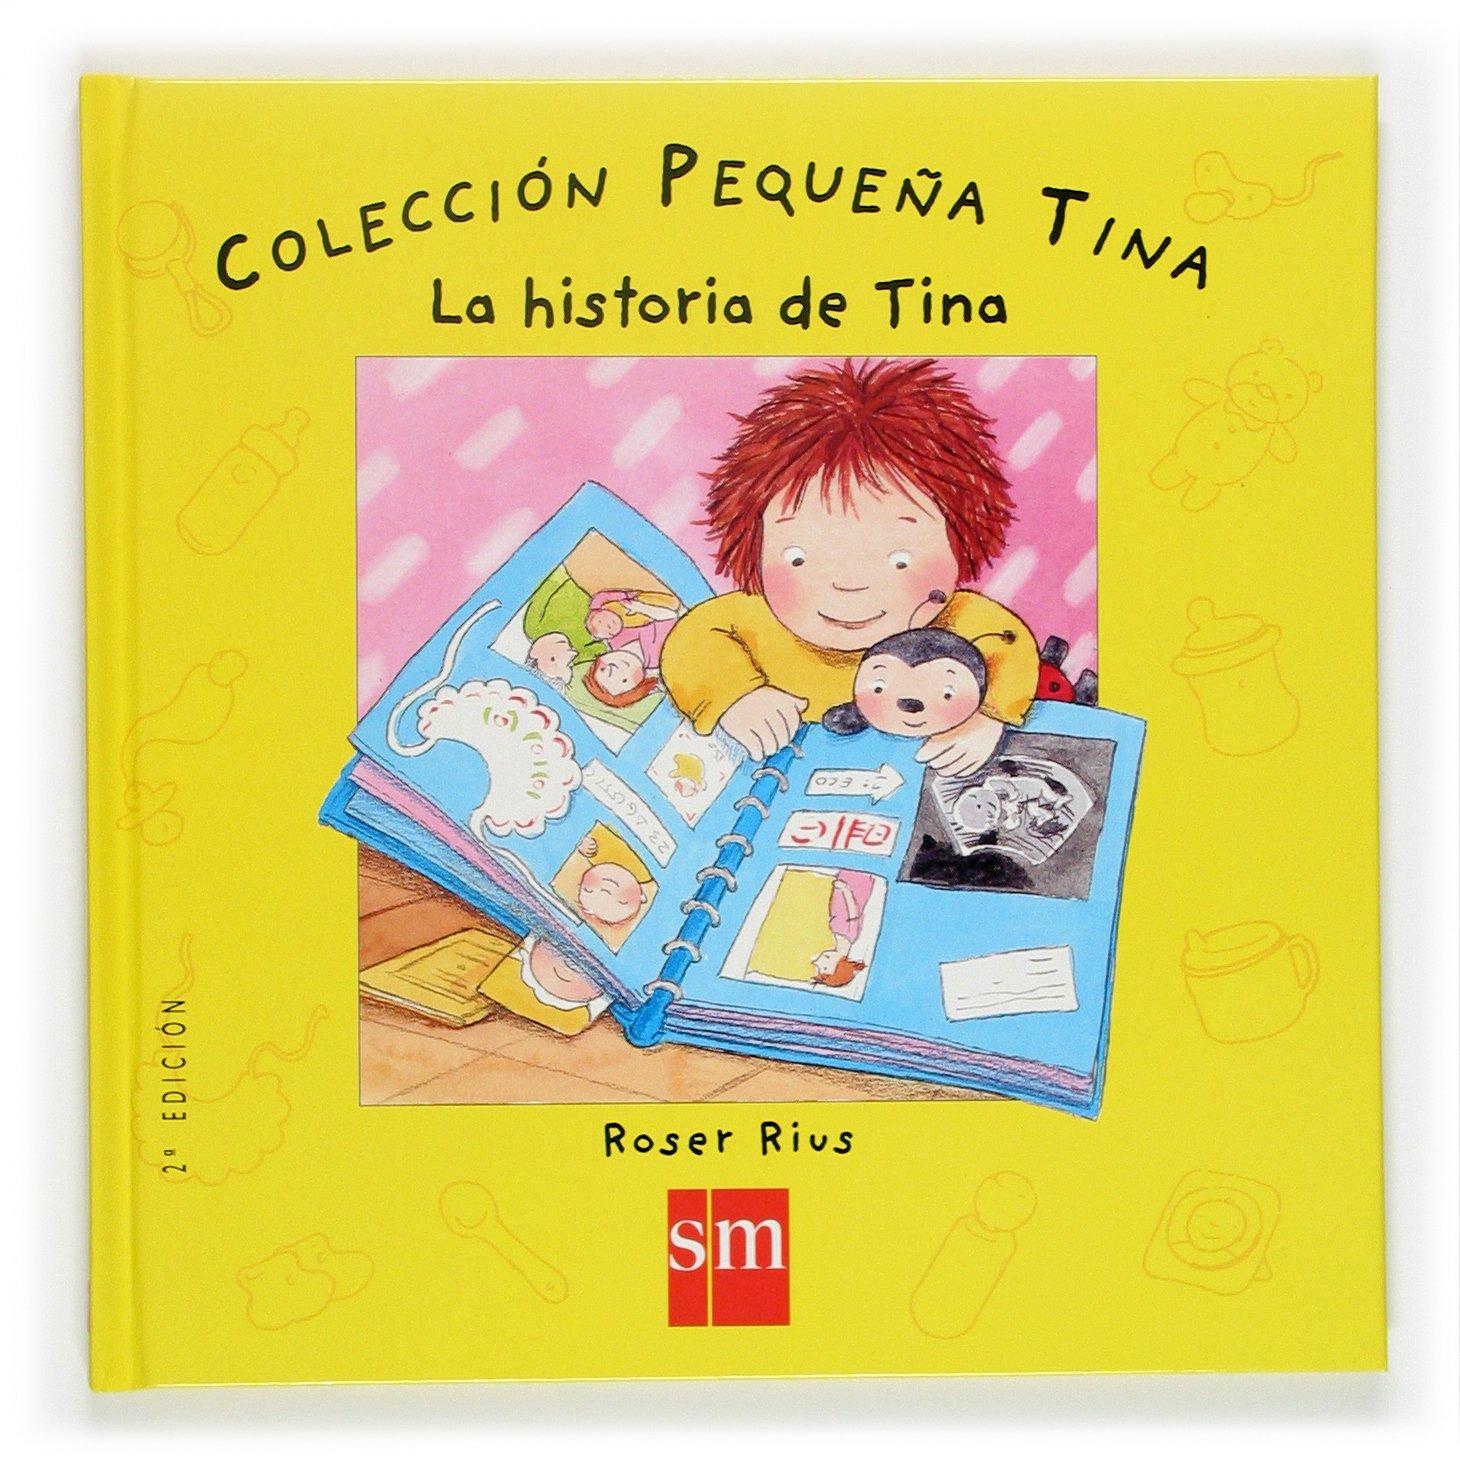 La historia de Tina (Pequeña tina): Amazon.es: Rius Camps, Roser, Rius Camps, Roser: Libros